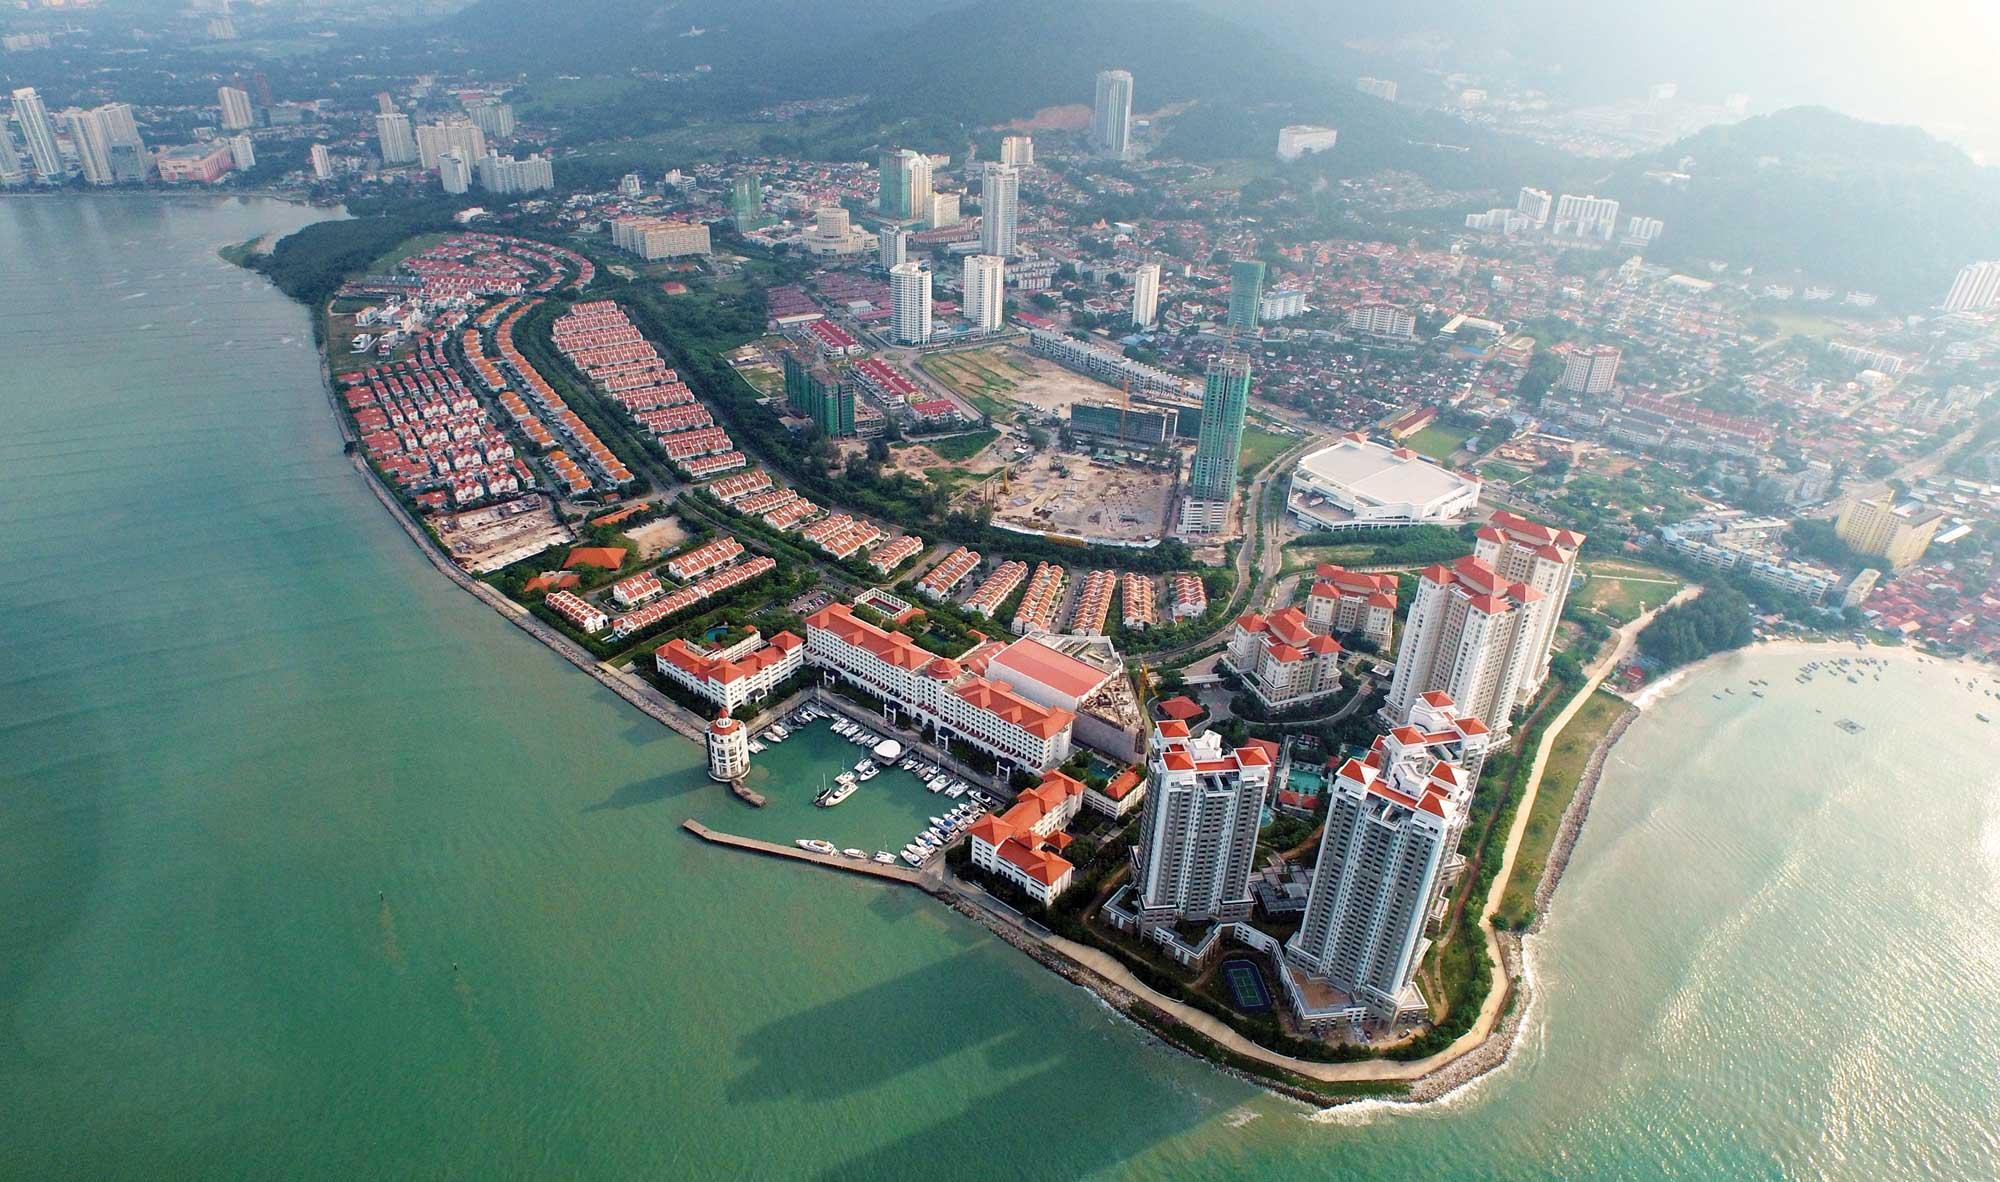 Ciudad de Tanjung Pinang